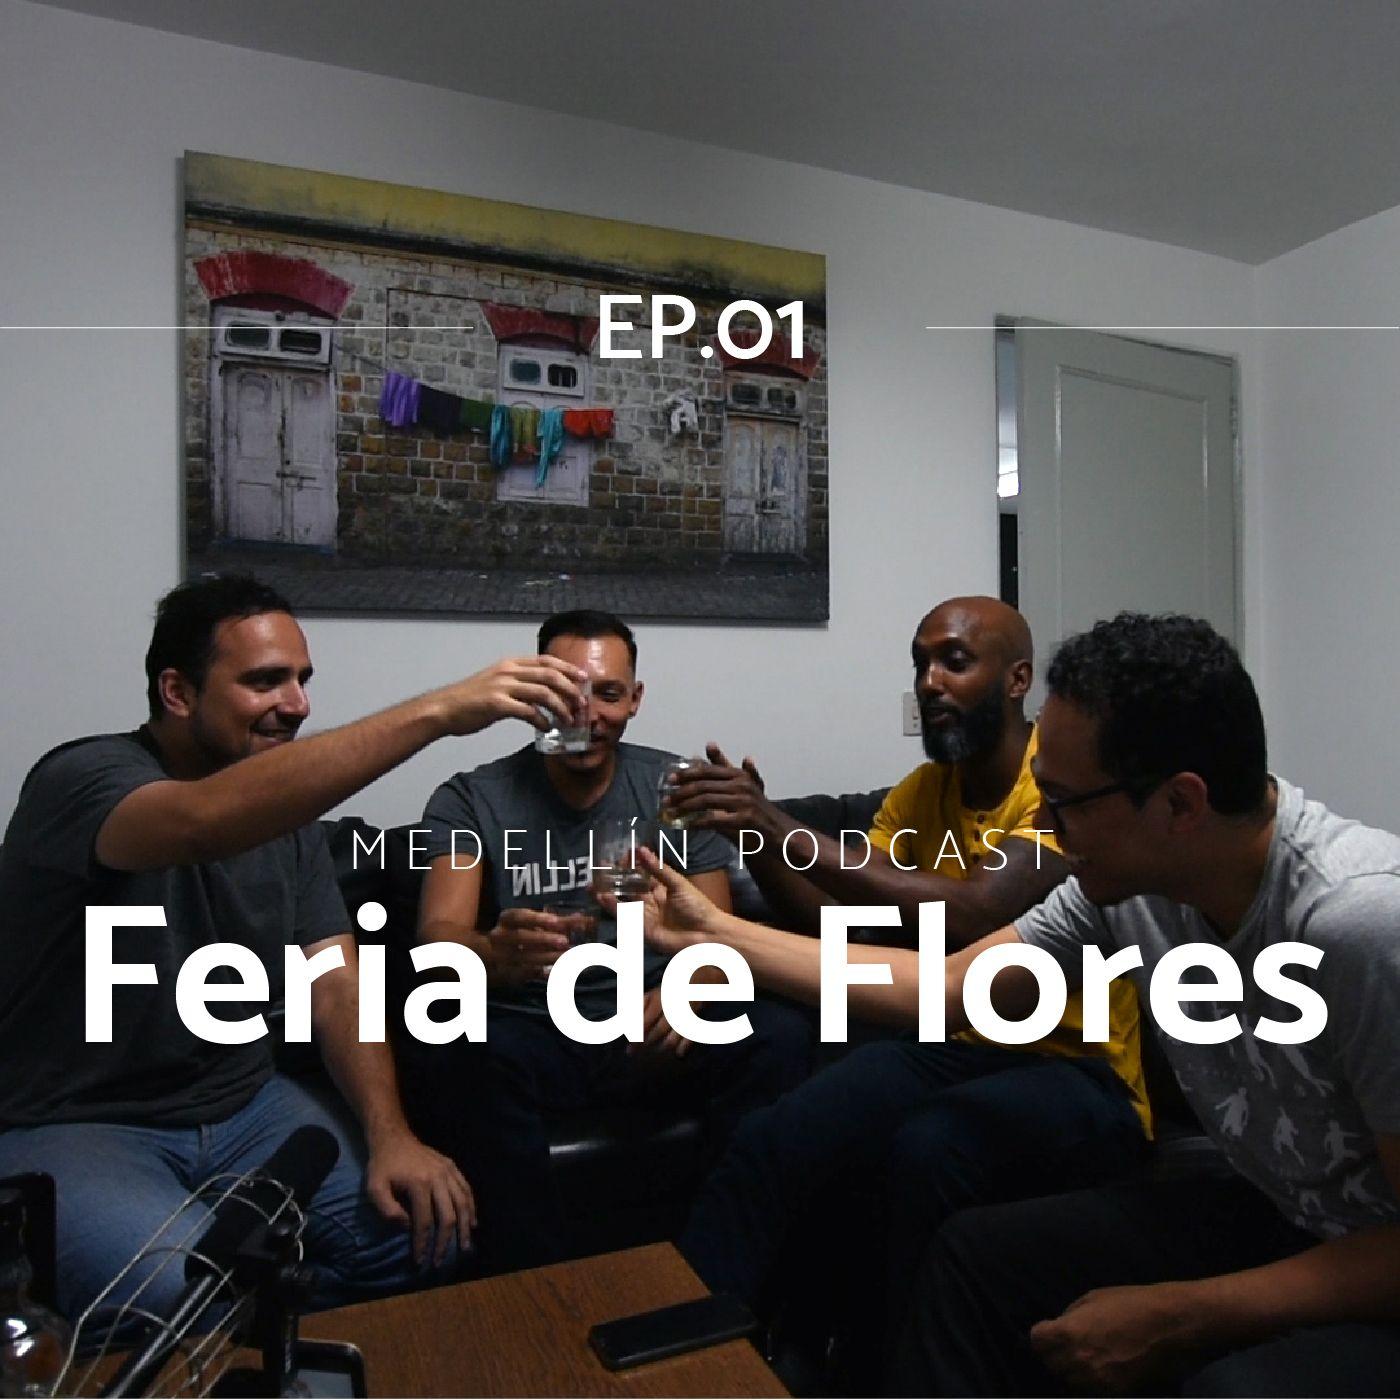 Feria De Flores - Medellin Podcast Ep.01